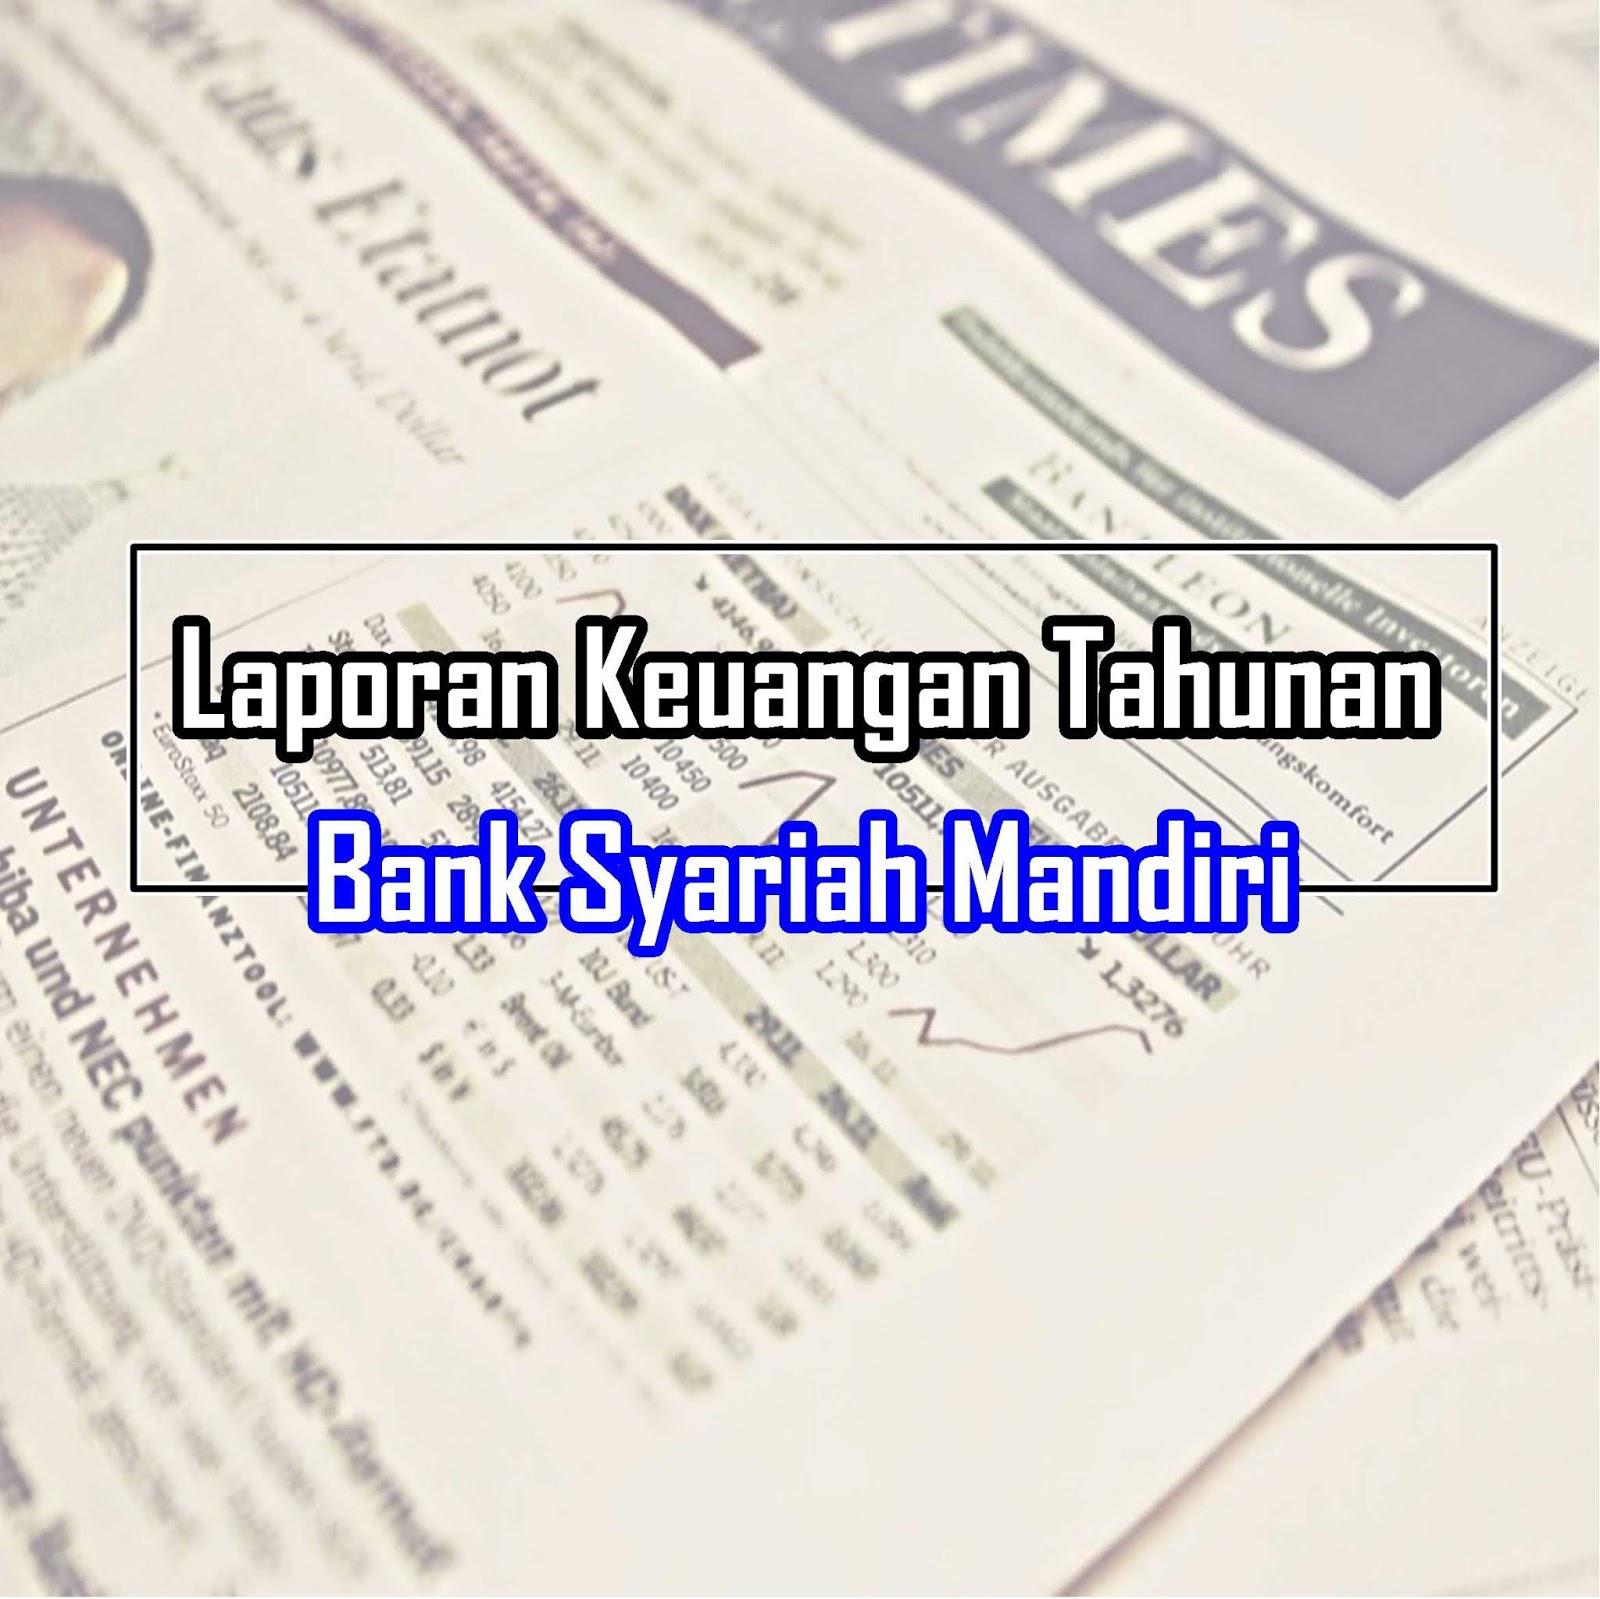 Download Laporan Keuangan Tahunan Bank Syariah Mandiri Rasio Keuangan Edusaham